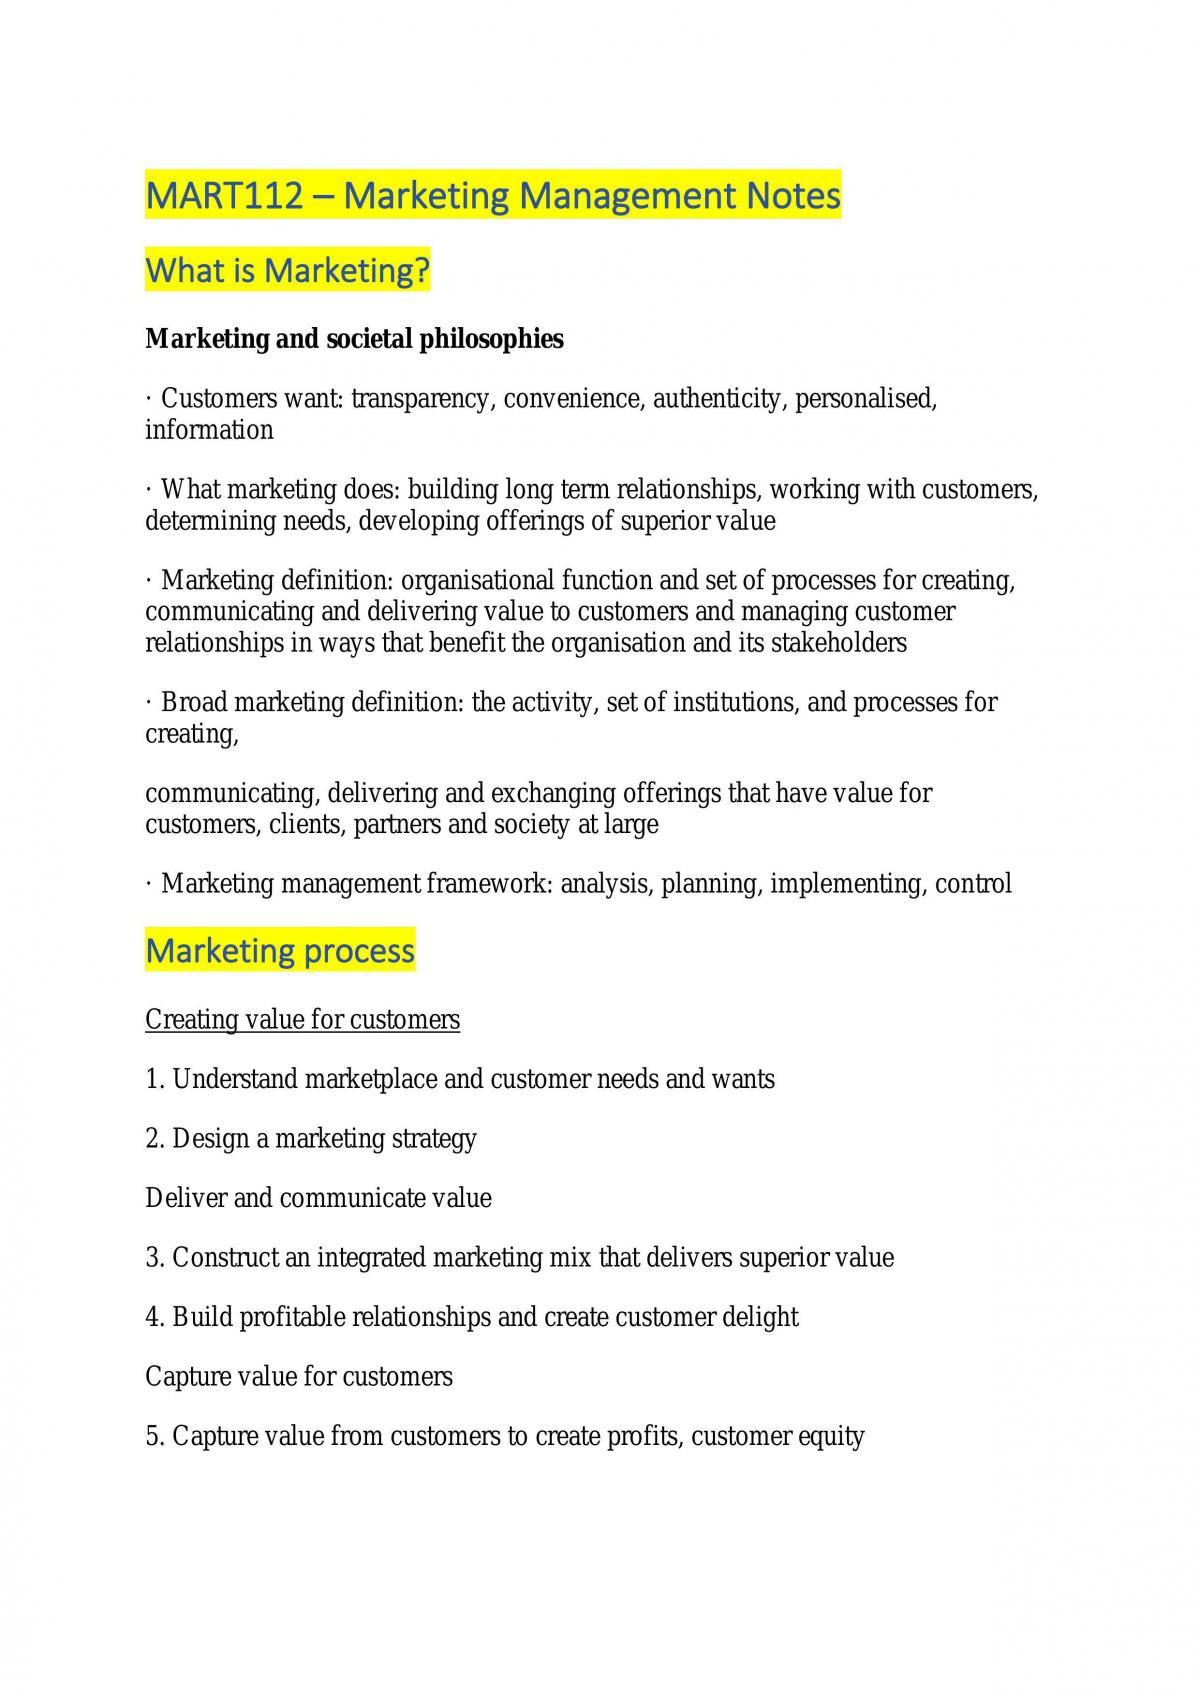 MART112 Marketing Management - Page 1